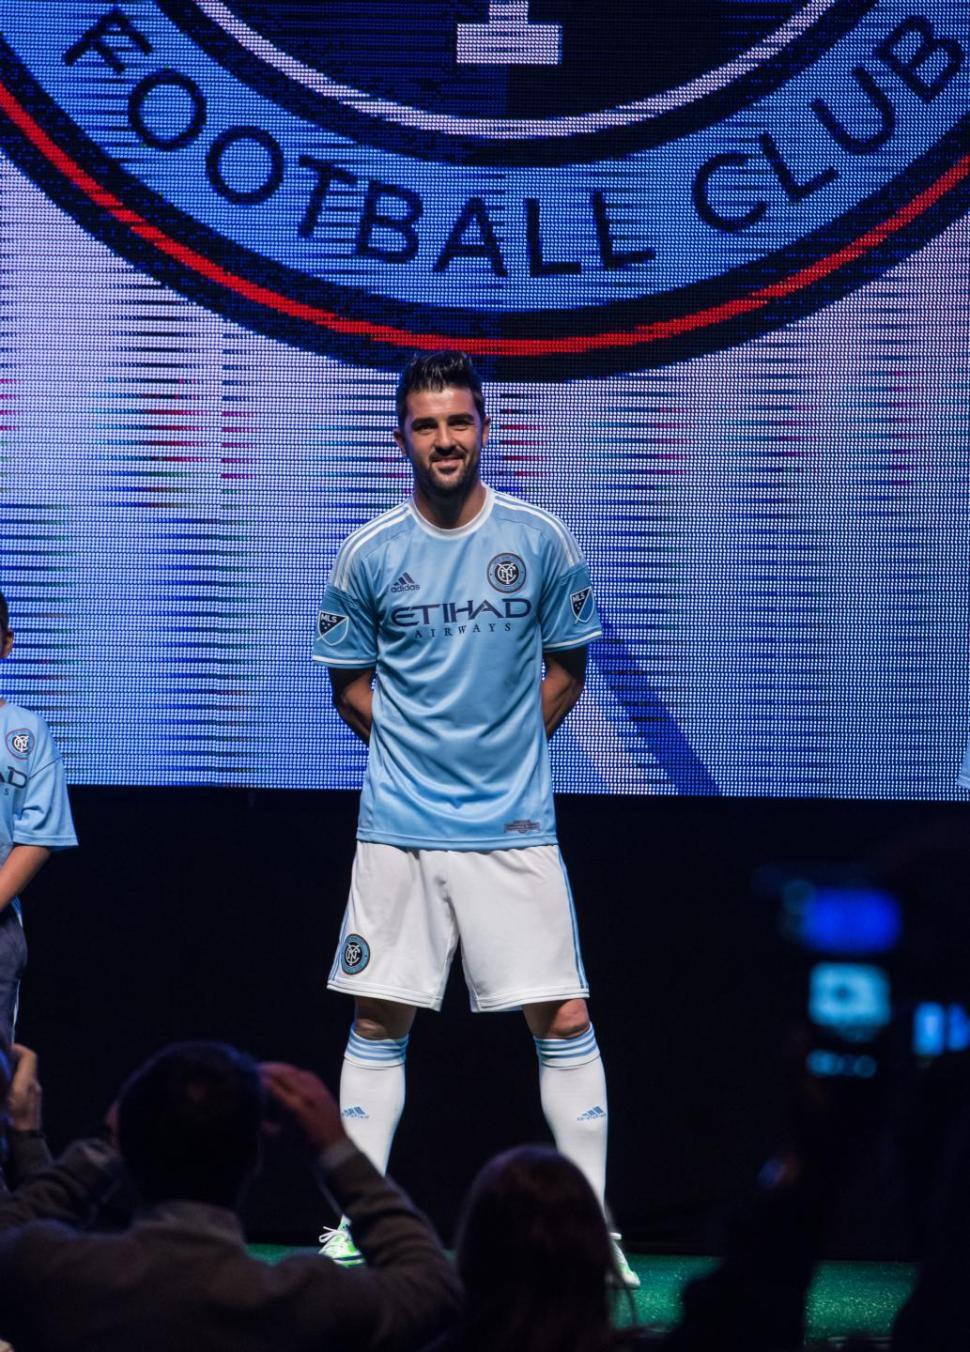 NYCFC home jersey mockup